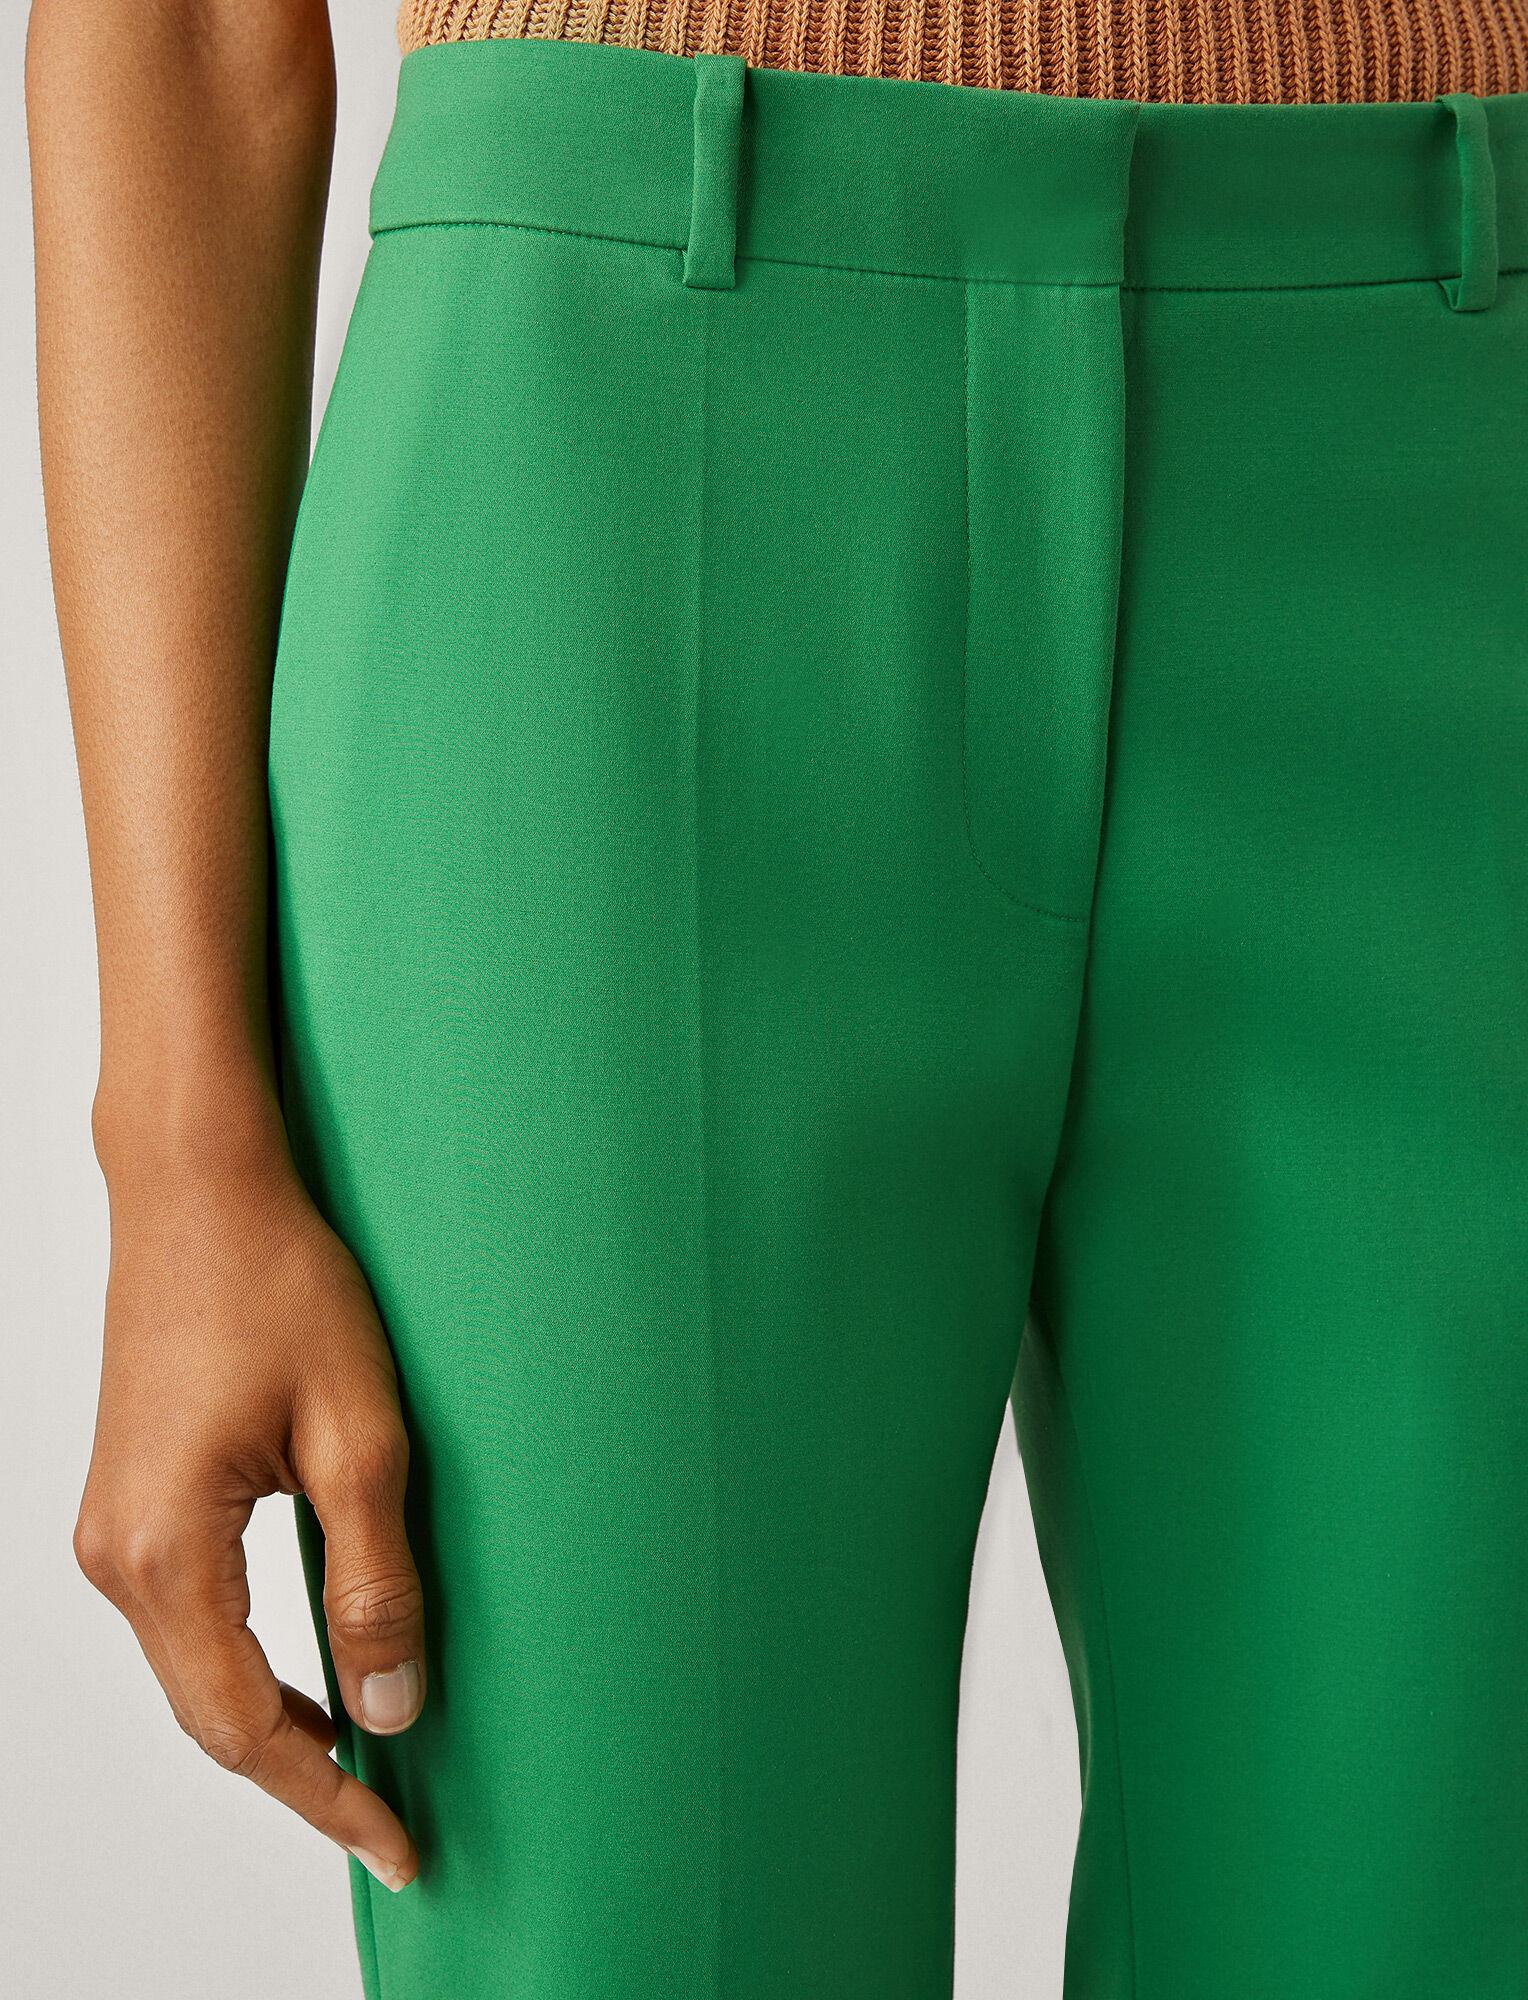 Joseph, Coleman Double Cotton Stretch Trousers, in AMAZON